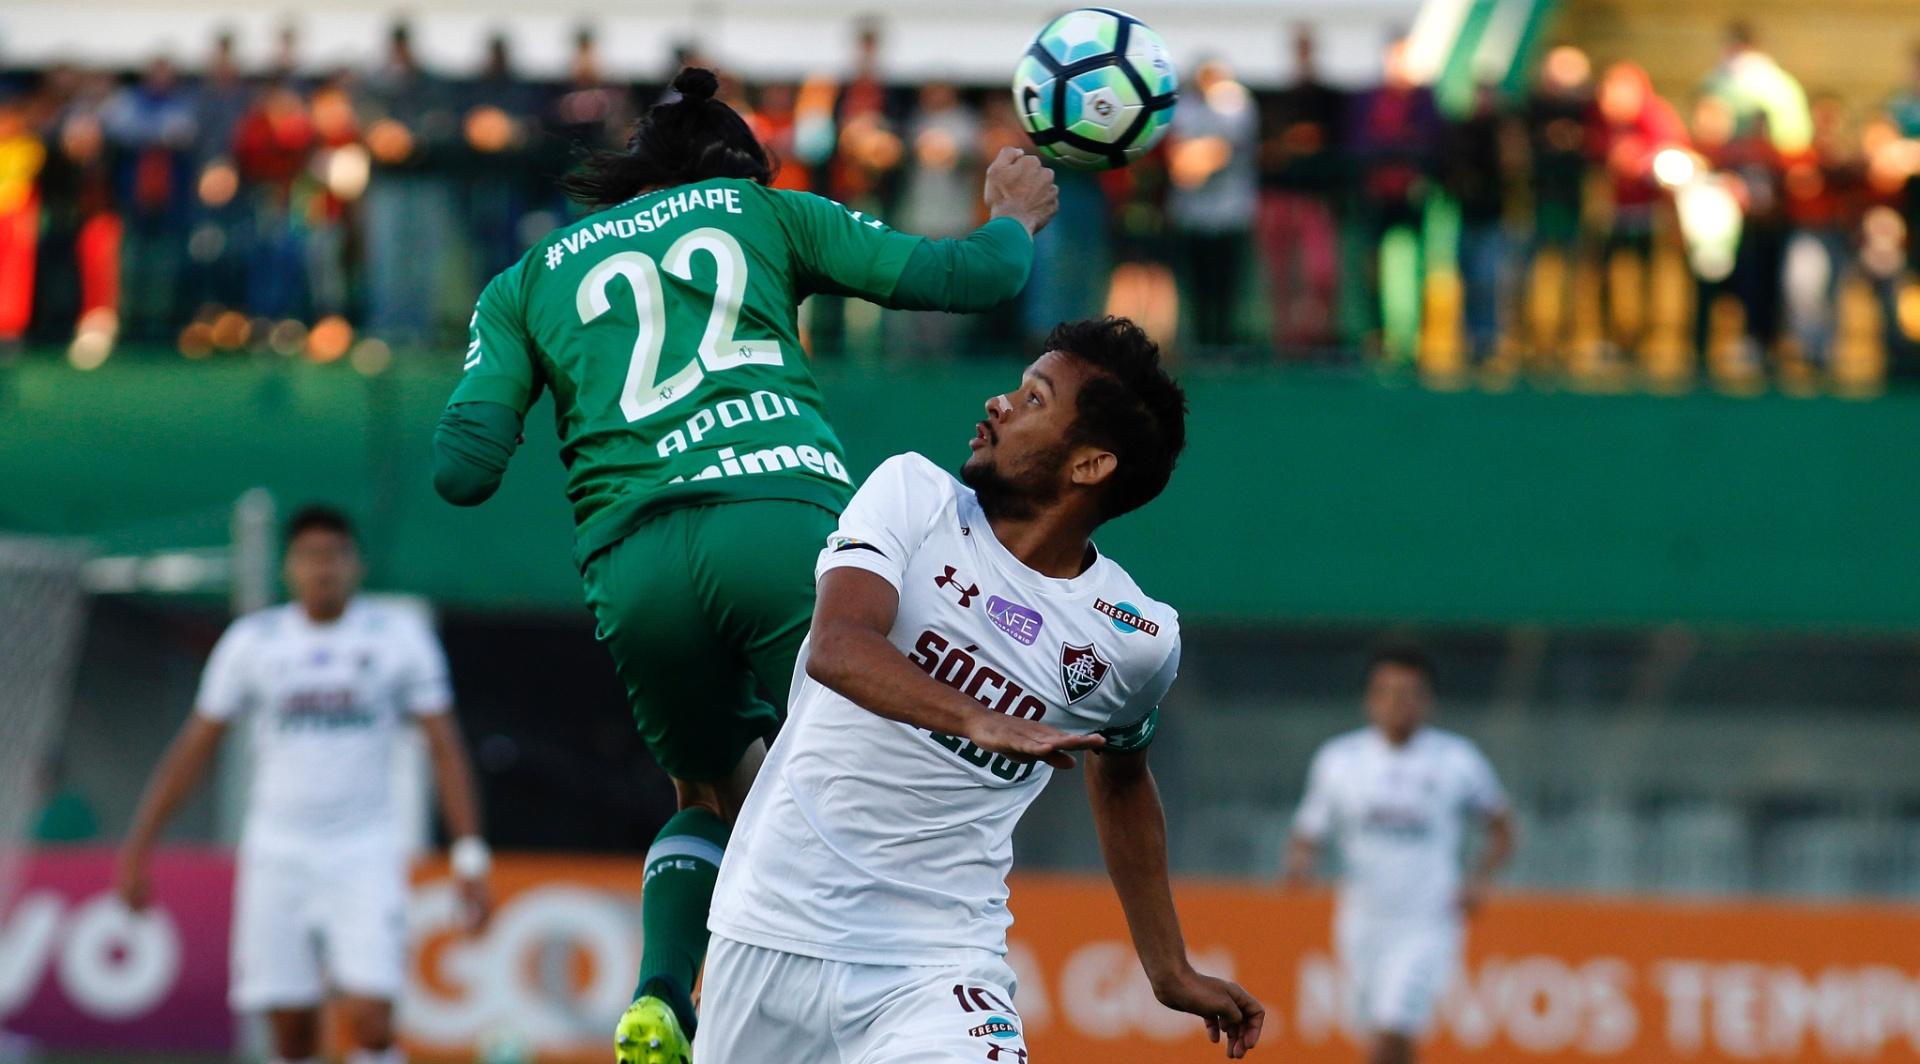 Apodi e Gustavo Scarpa disputam a bola no jogo entre Chapecoense e Fluminense